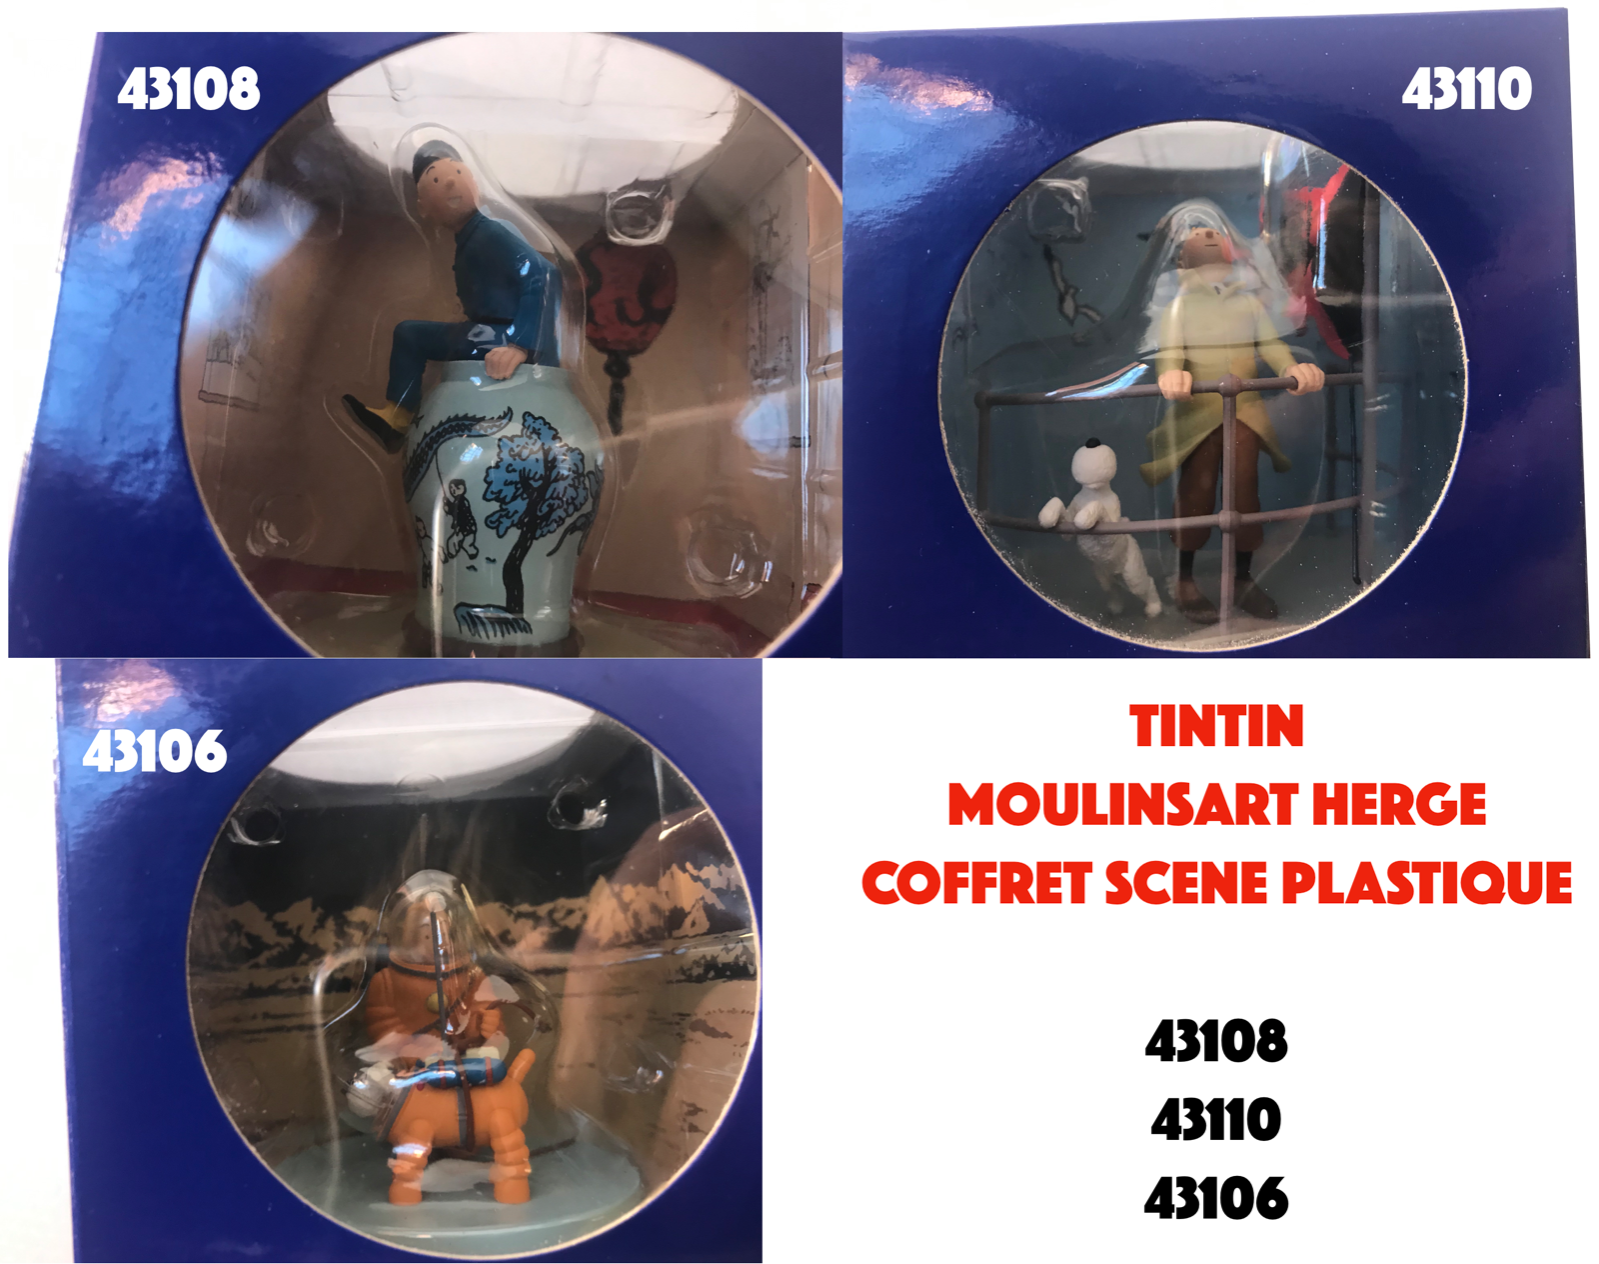 TINTIN MOULINSART HERGE COFFRET SCENE PLASTIQUE 43108 43110 43106